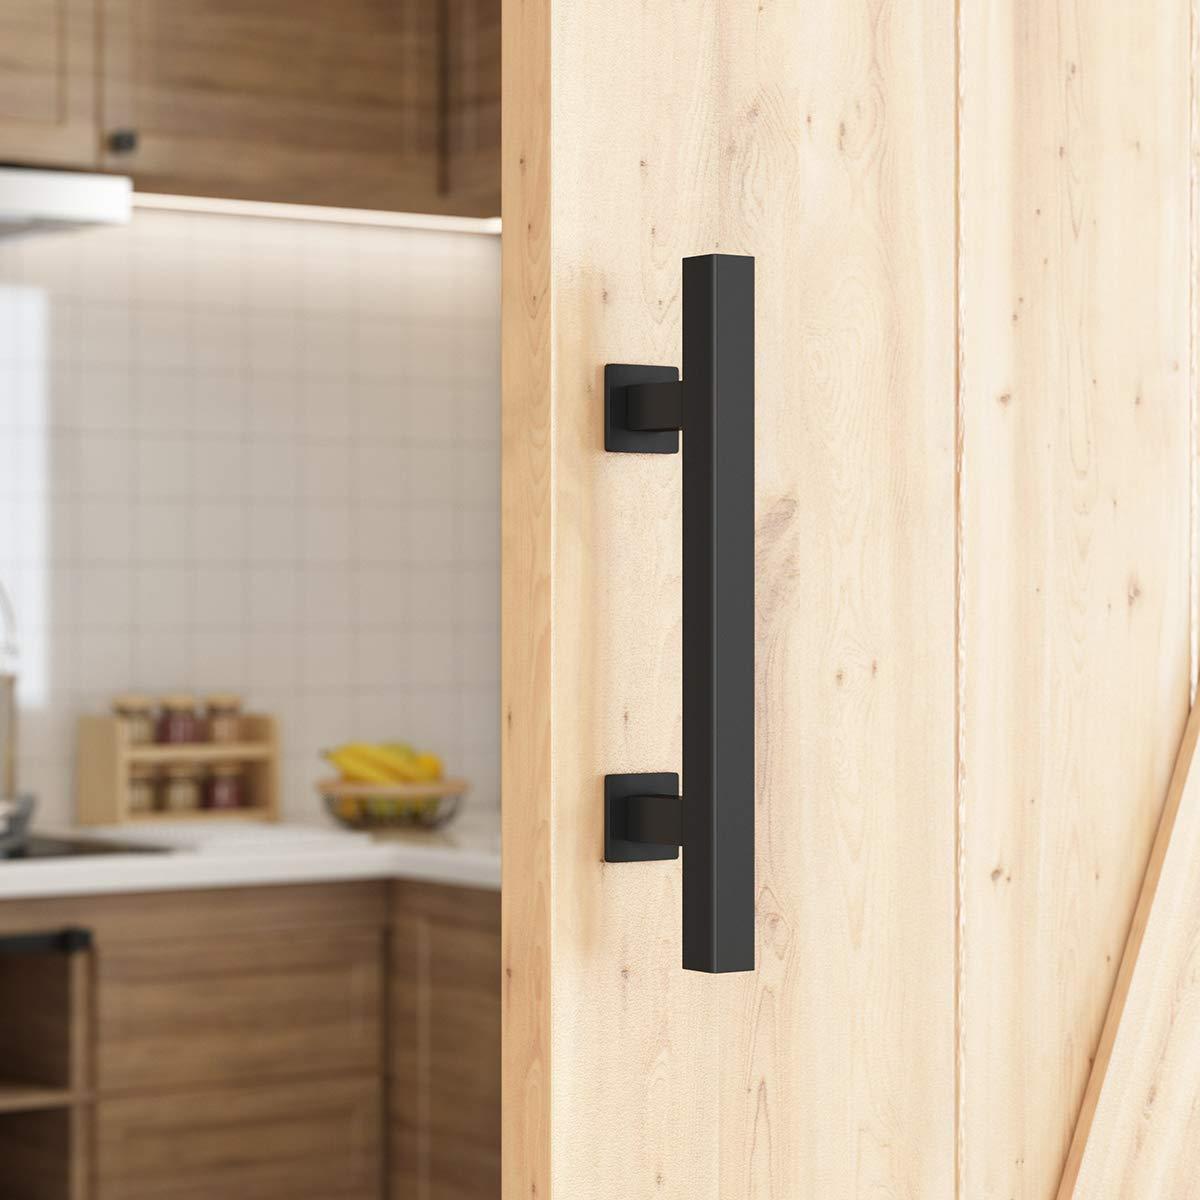 "SMARTSTANDARD 10"" Heavy Duty Barn Door Pull Handle for Gate Kitchen Furniture Cabinet Closet Drawer"